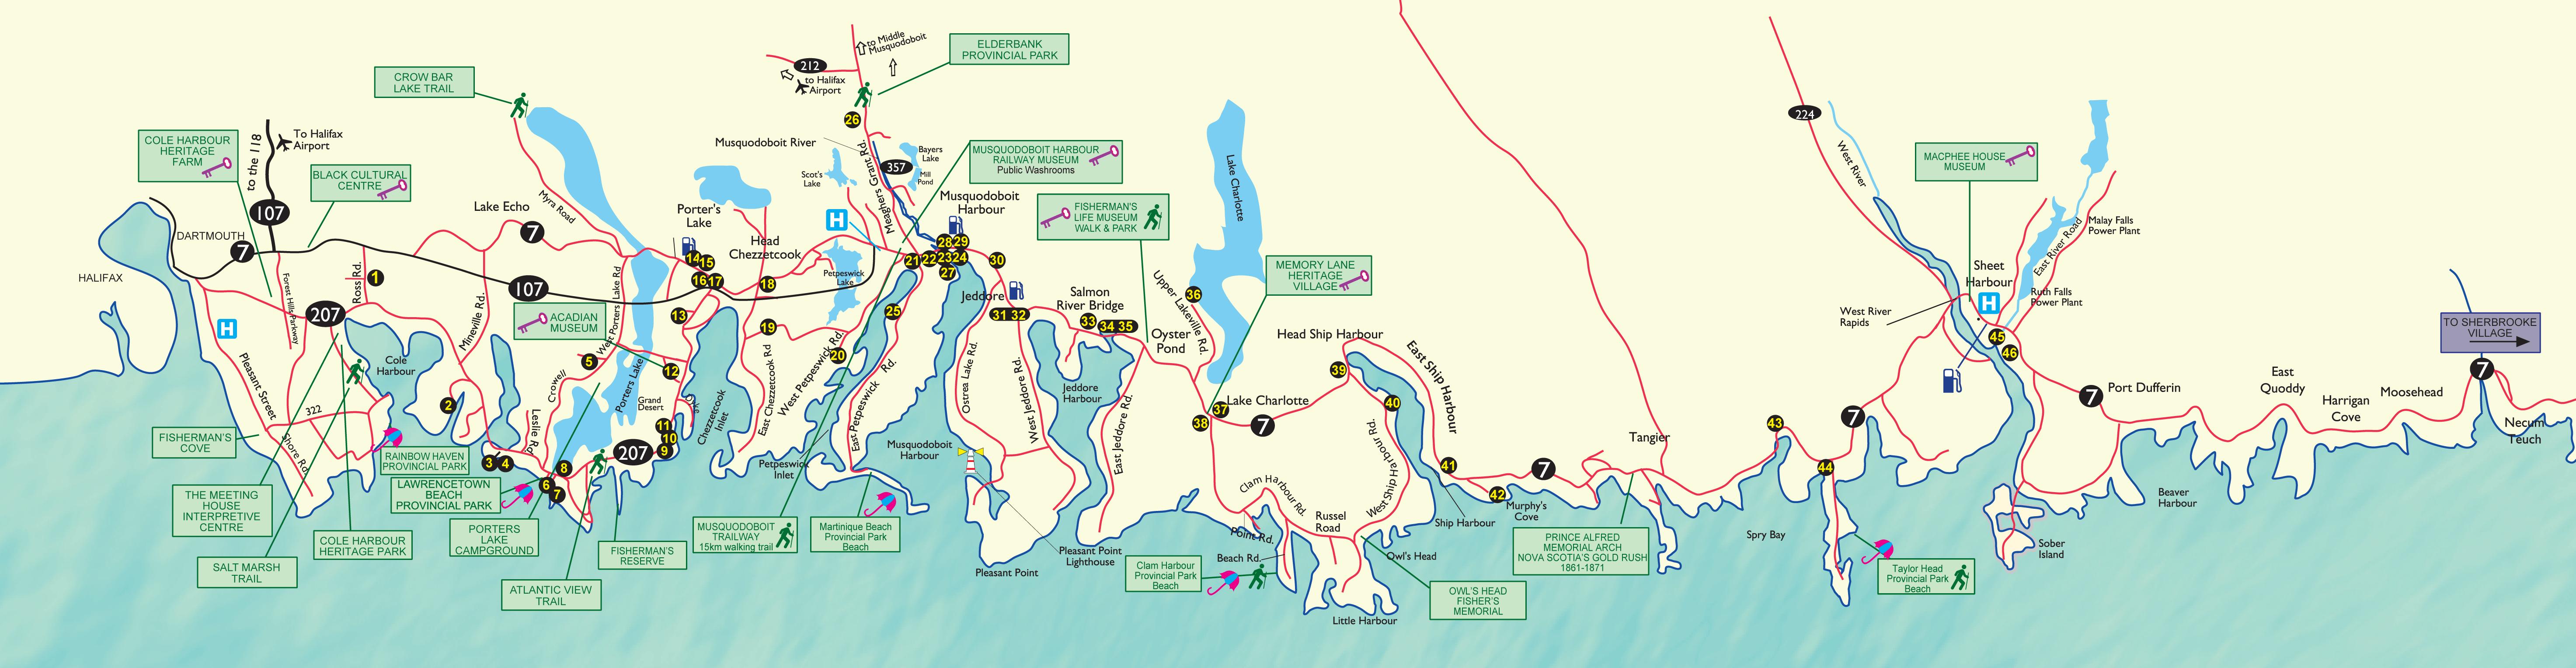 Seacoasttrail Eastern Shore Nova Scotia Marine Drive Find BB